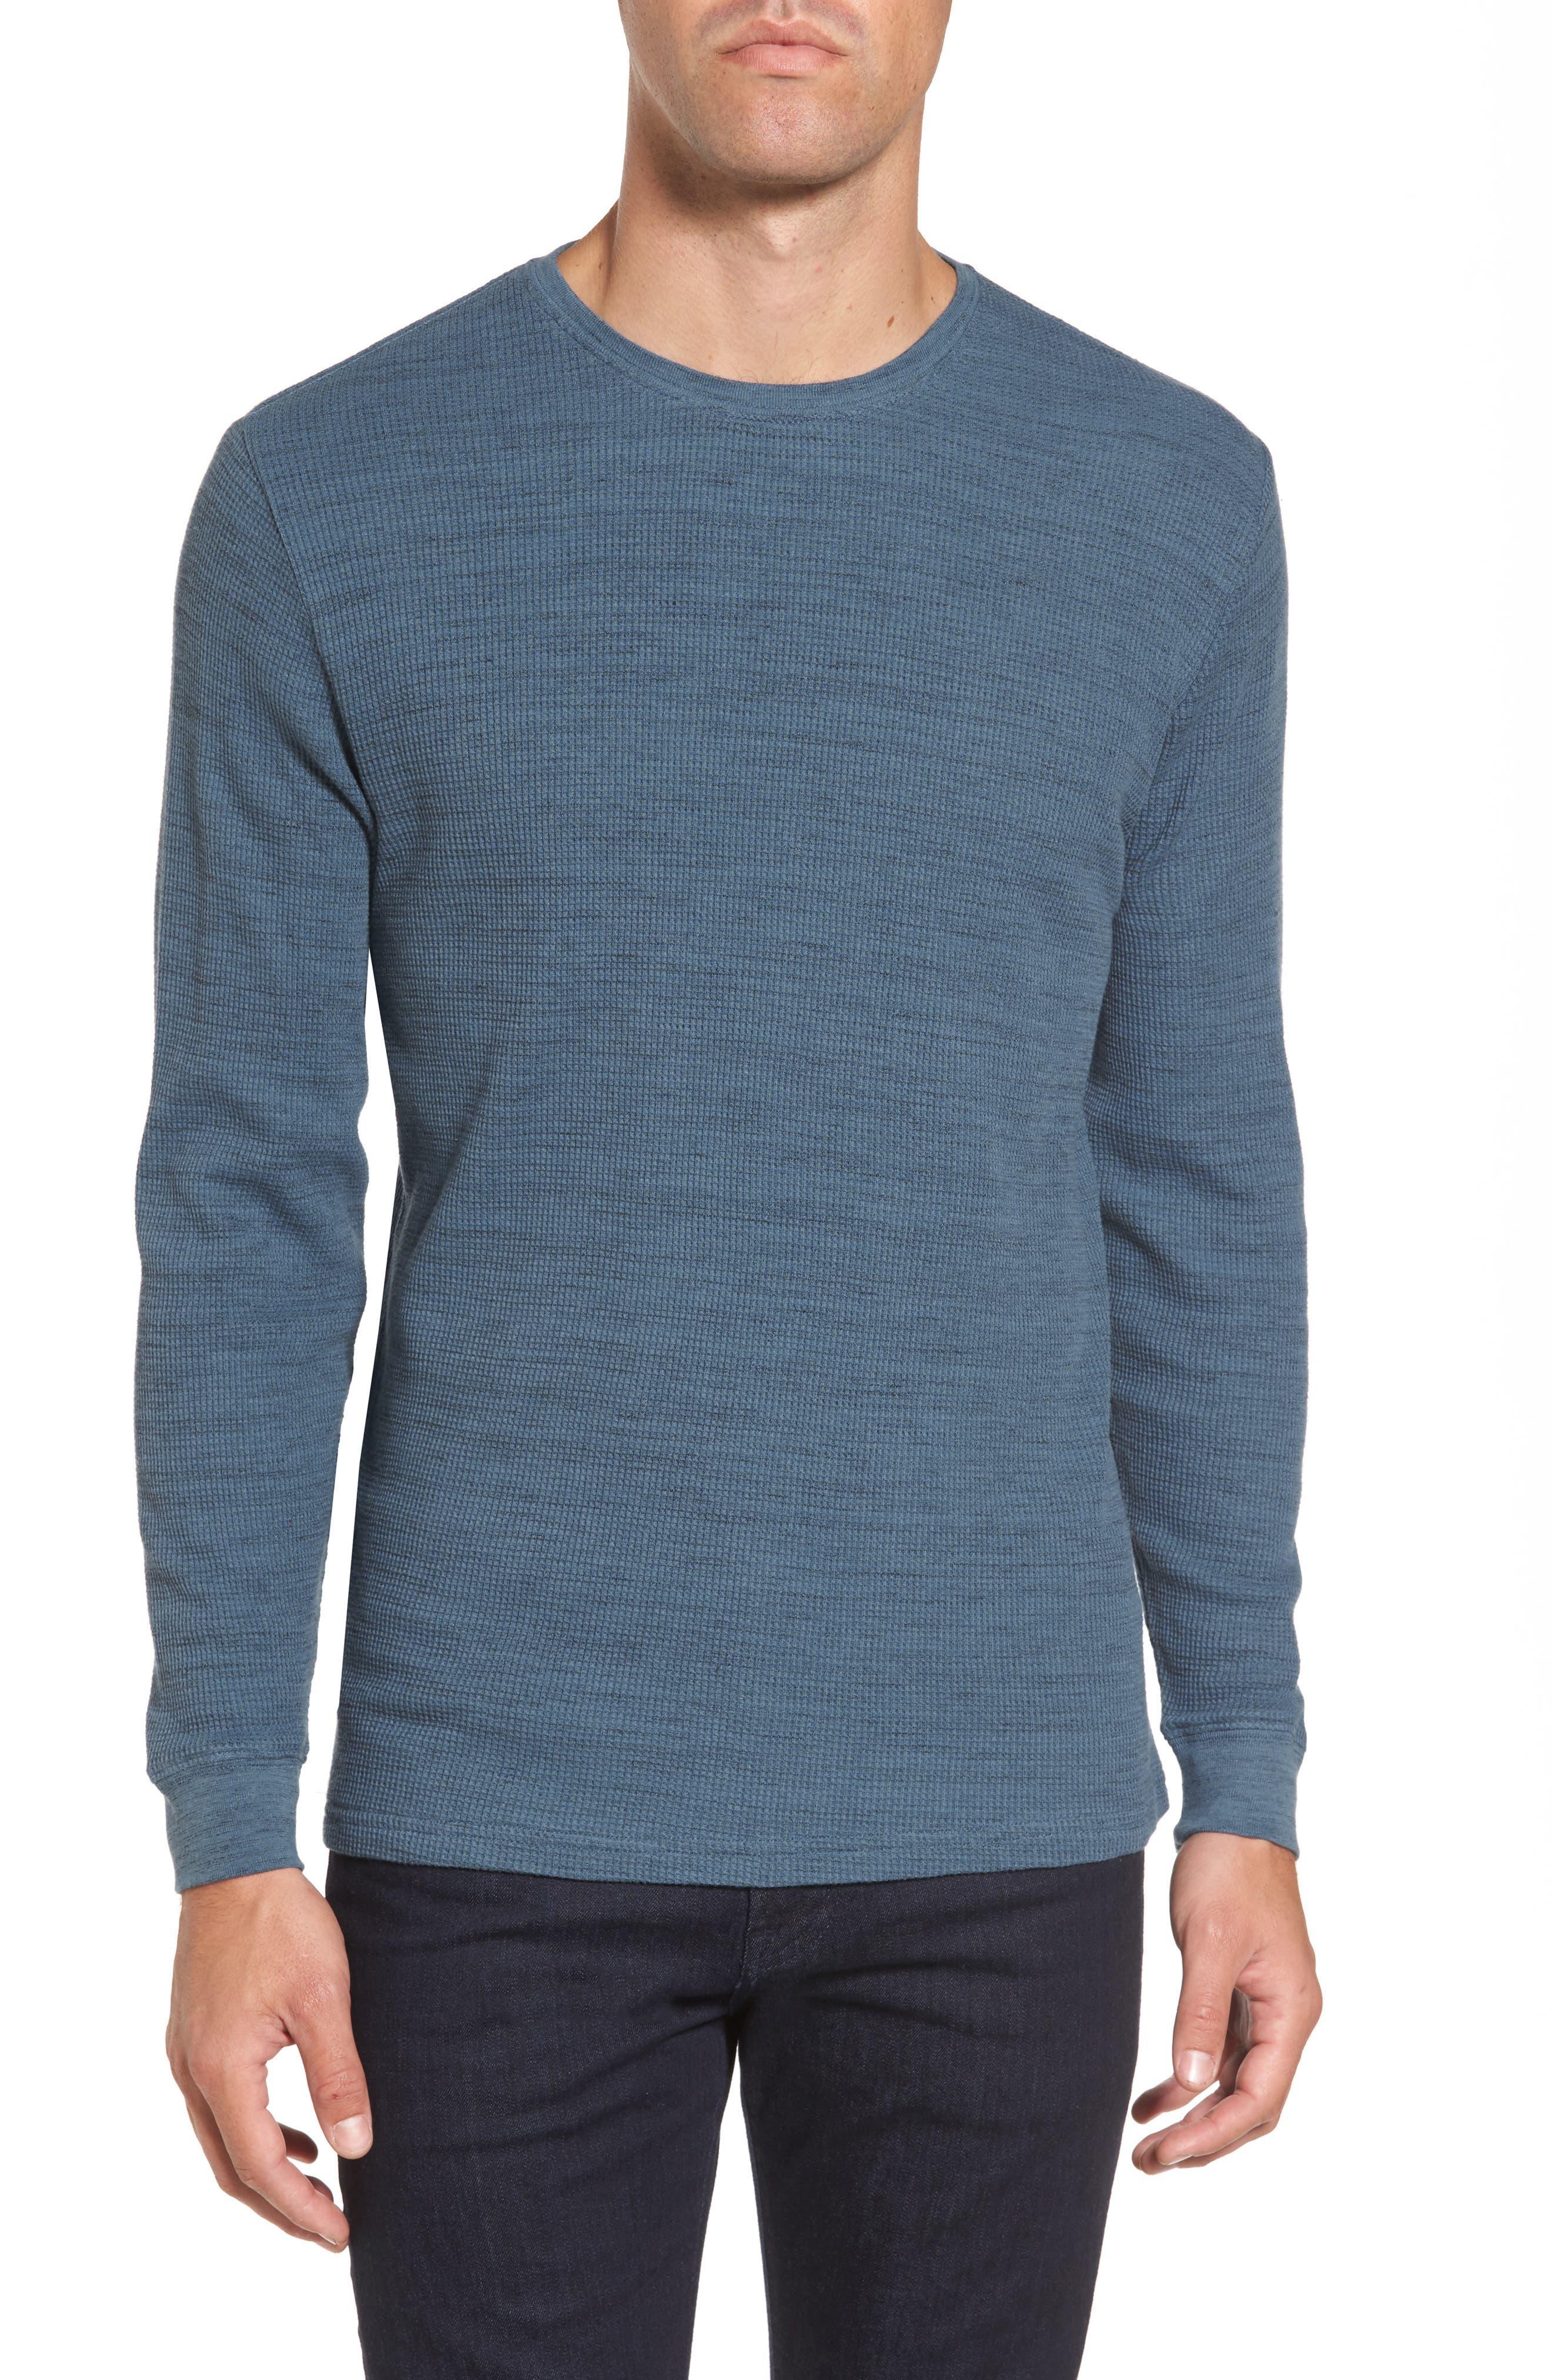 Alternate Image 1 Selected - Coastaoro Vista Waffle Knit T-Shirt